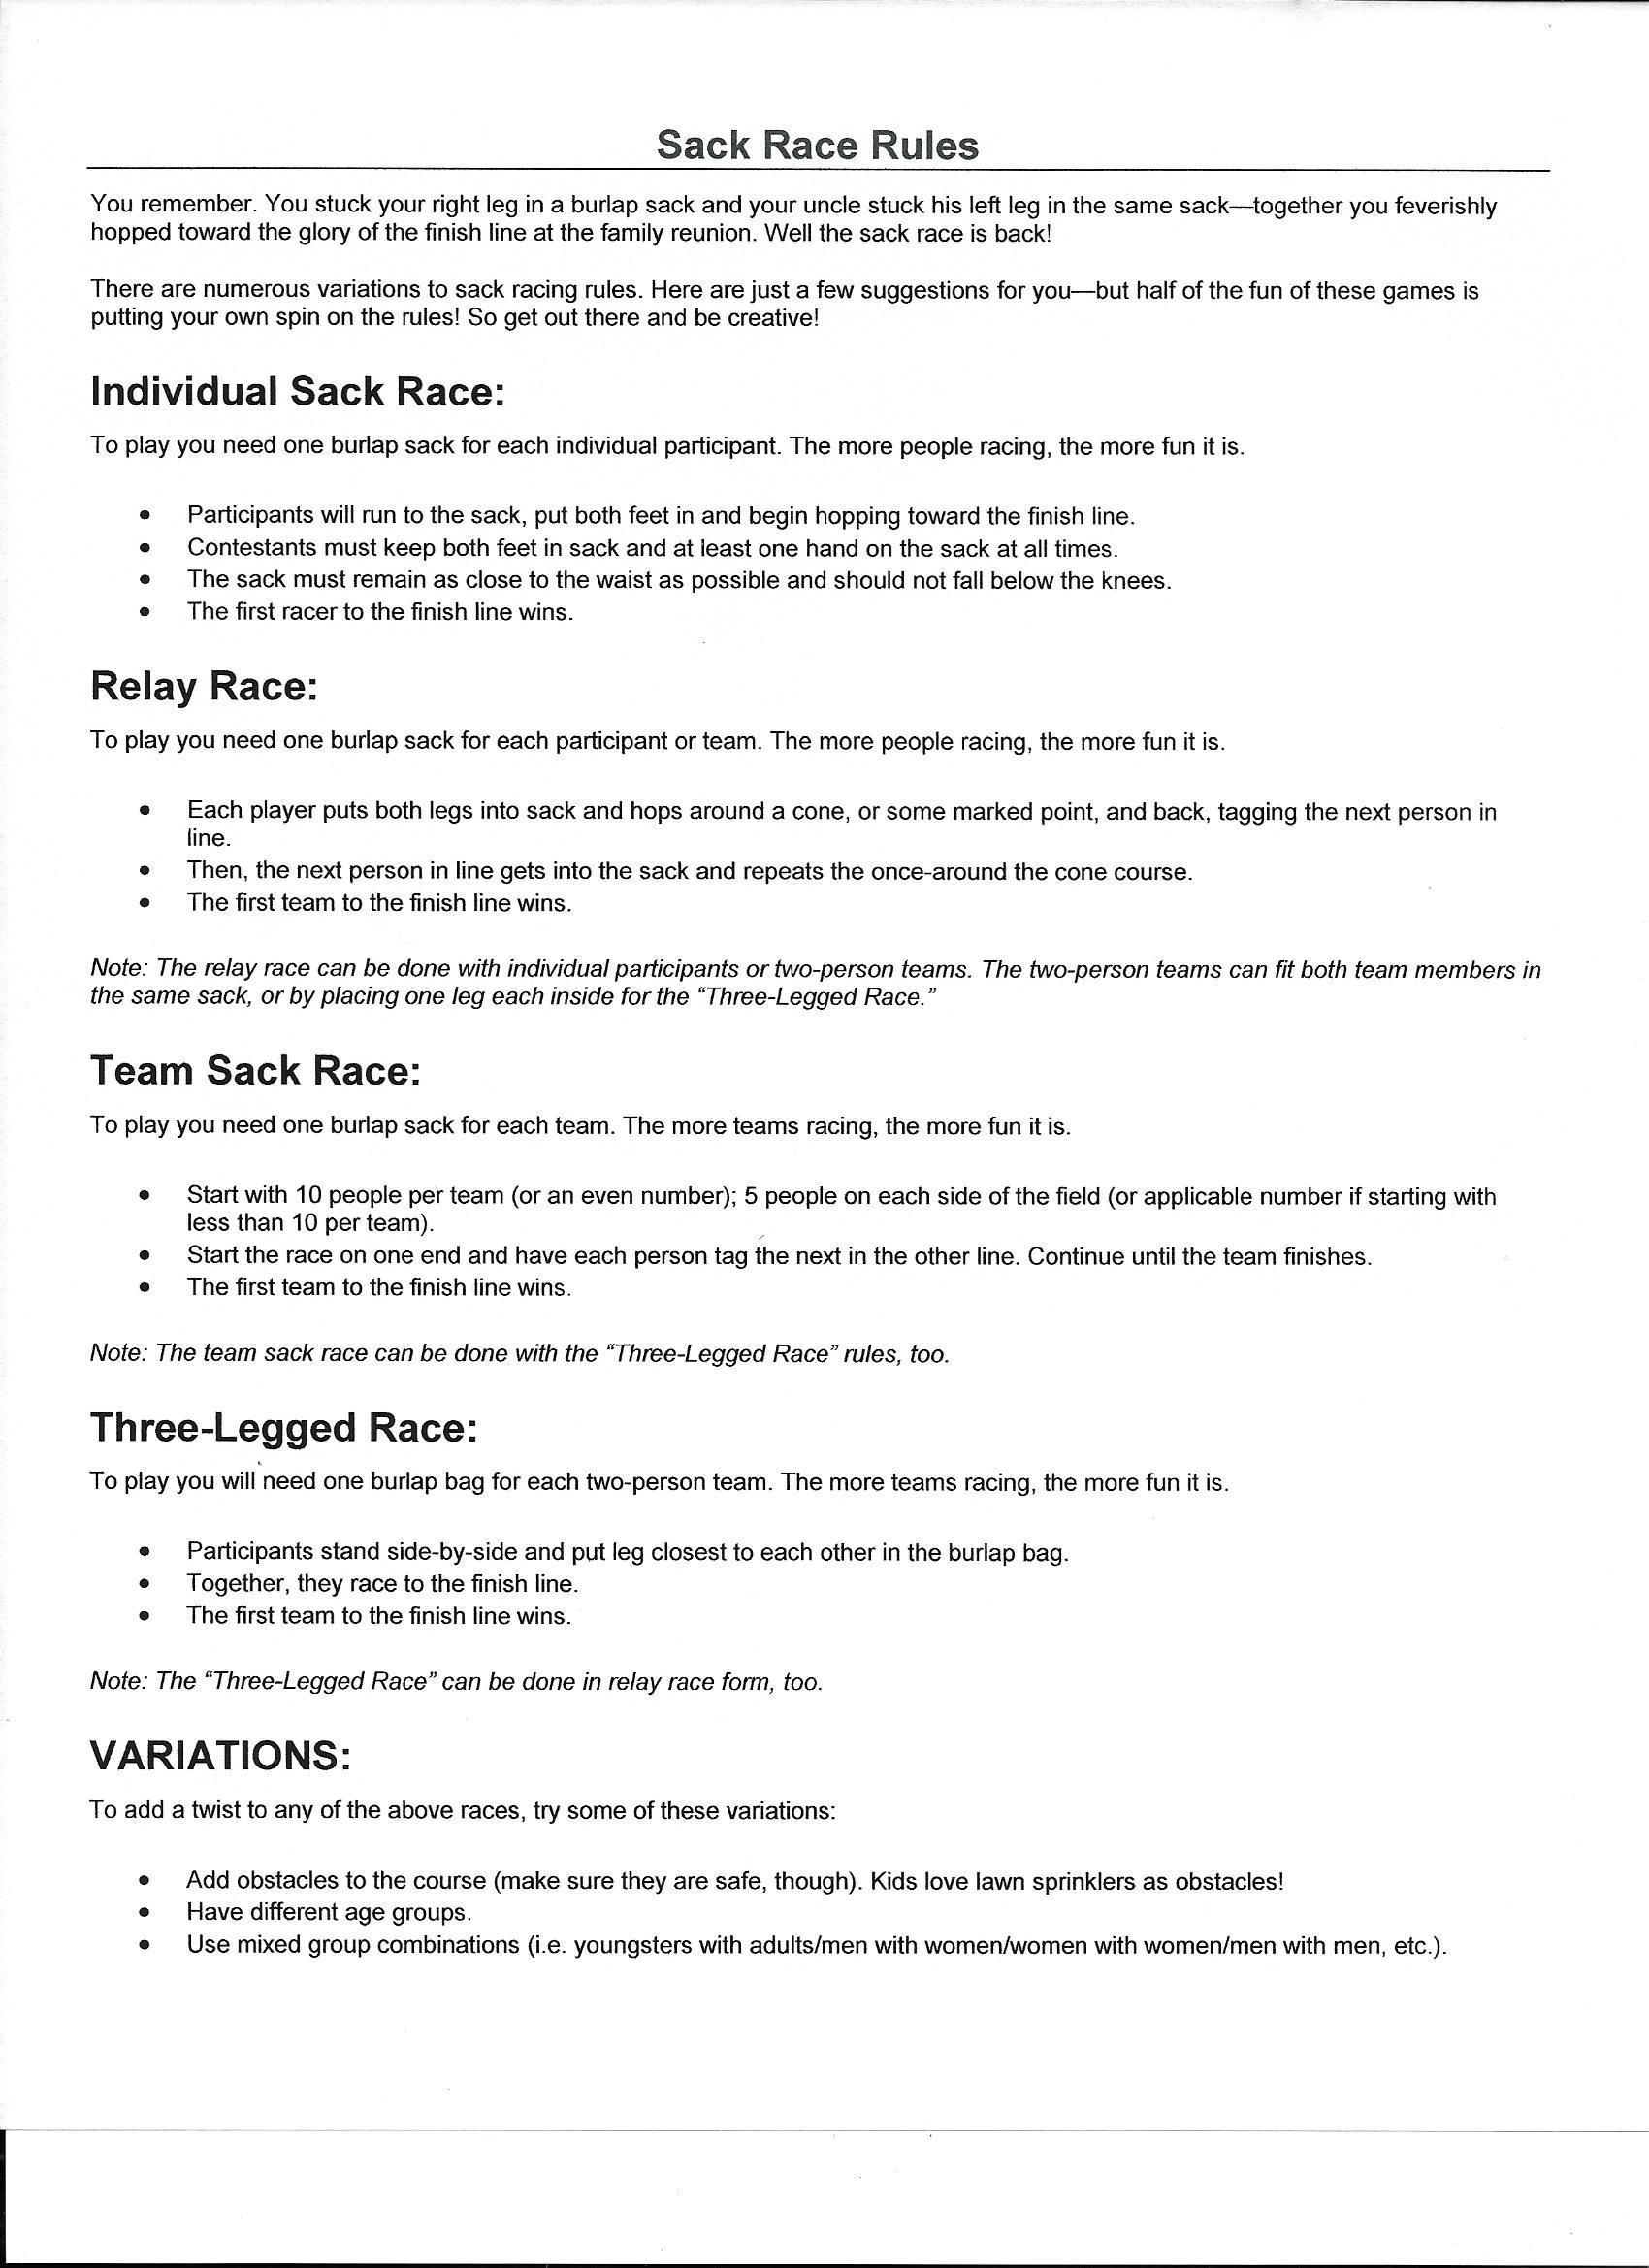 sack-race-rules.jpg